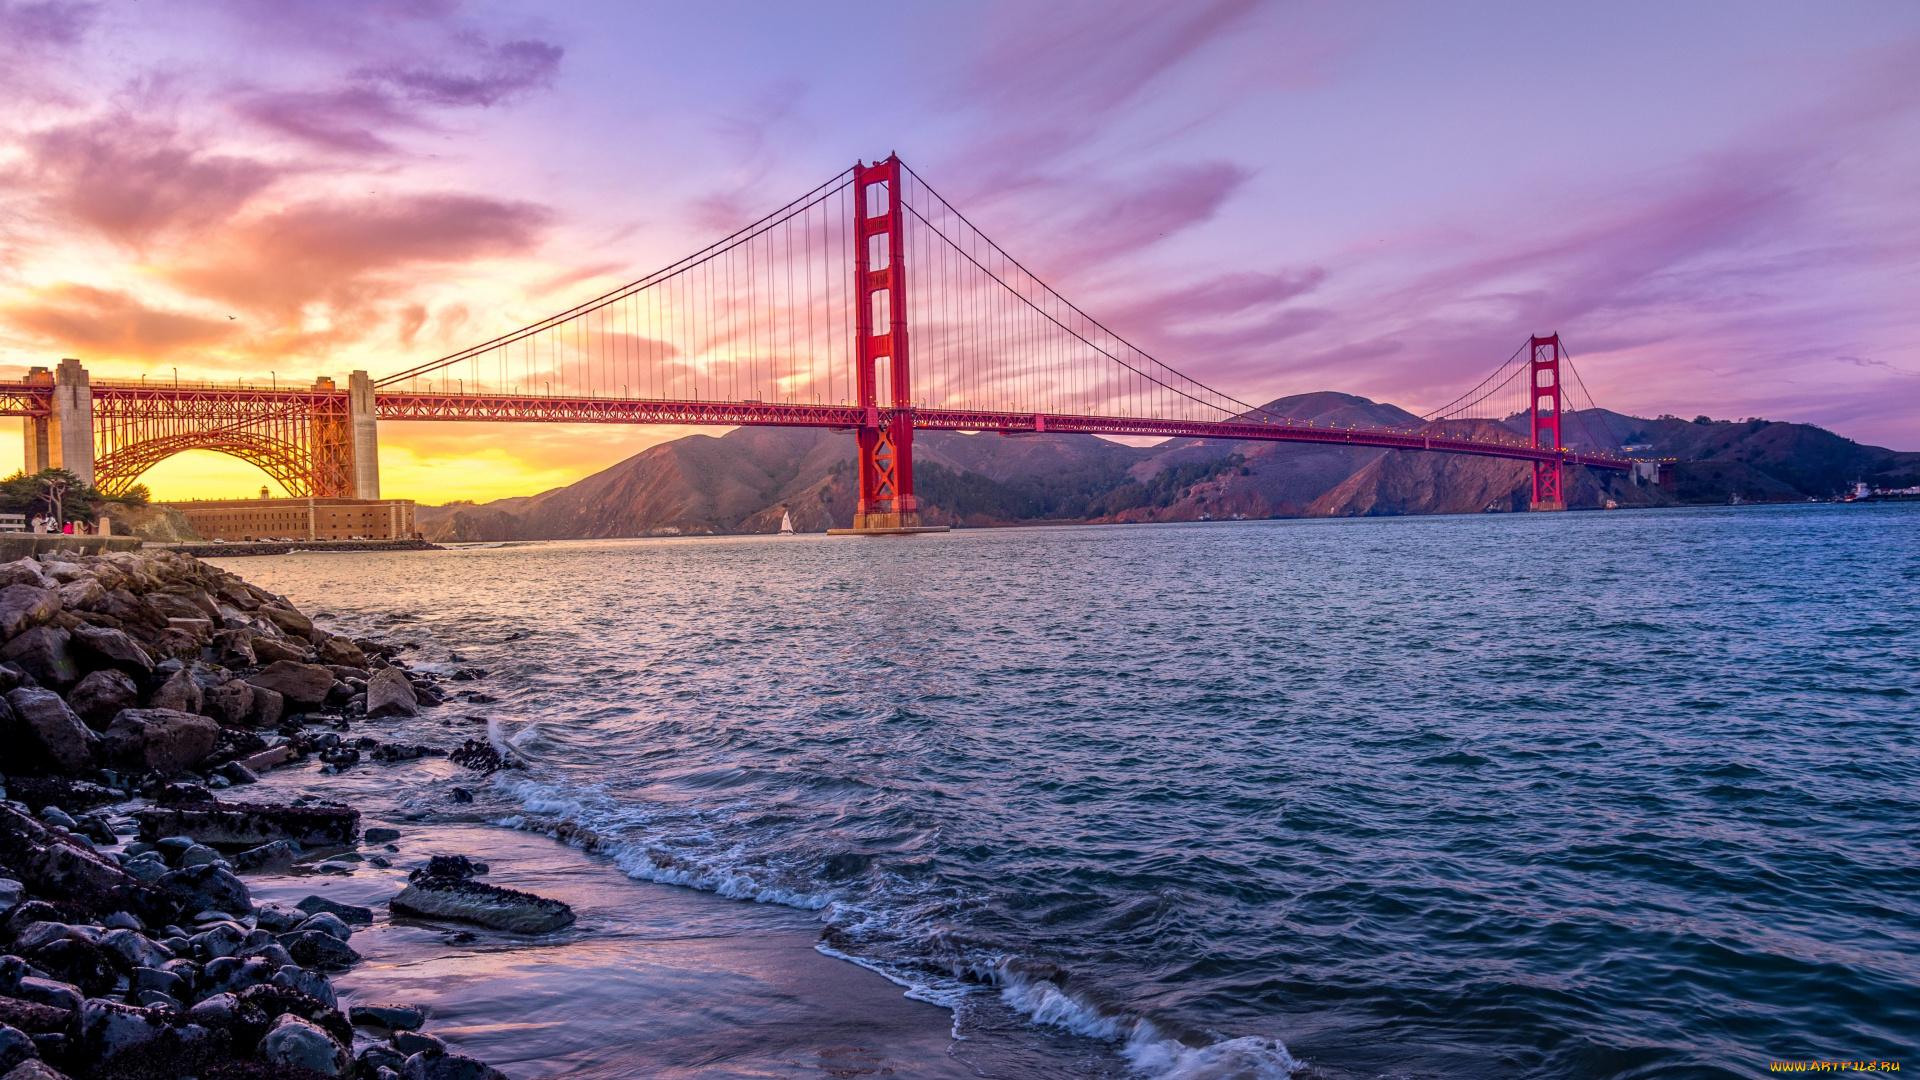 Bay Area image